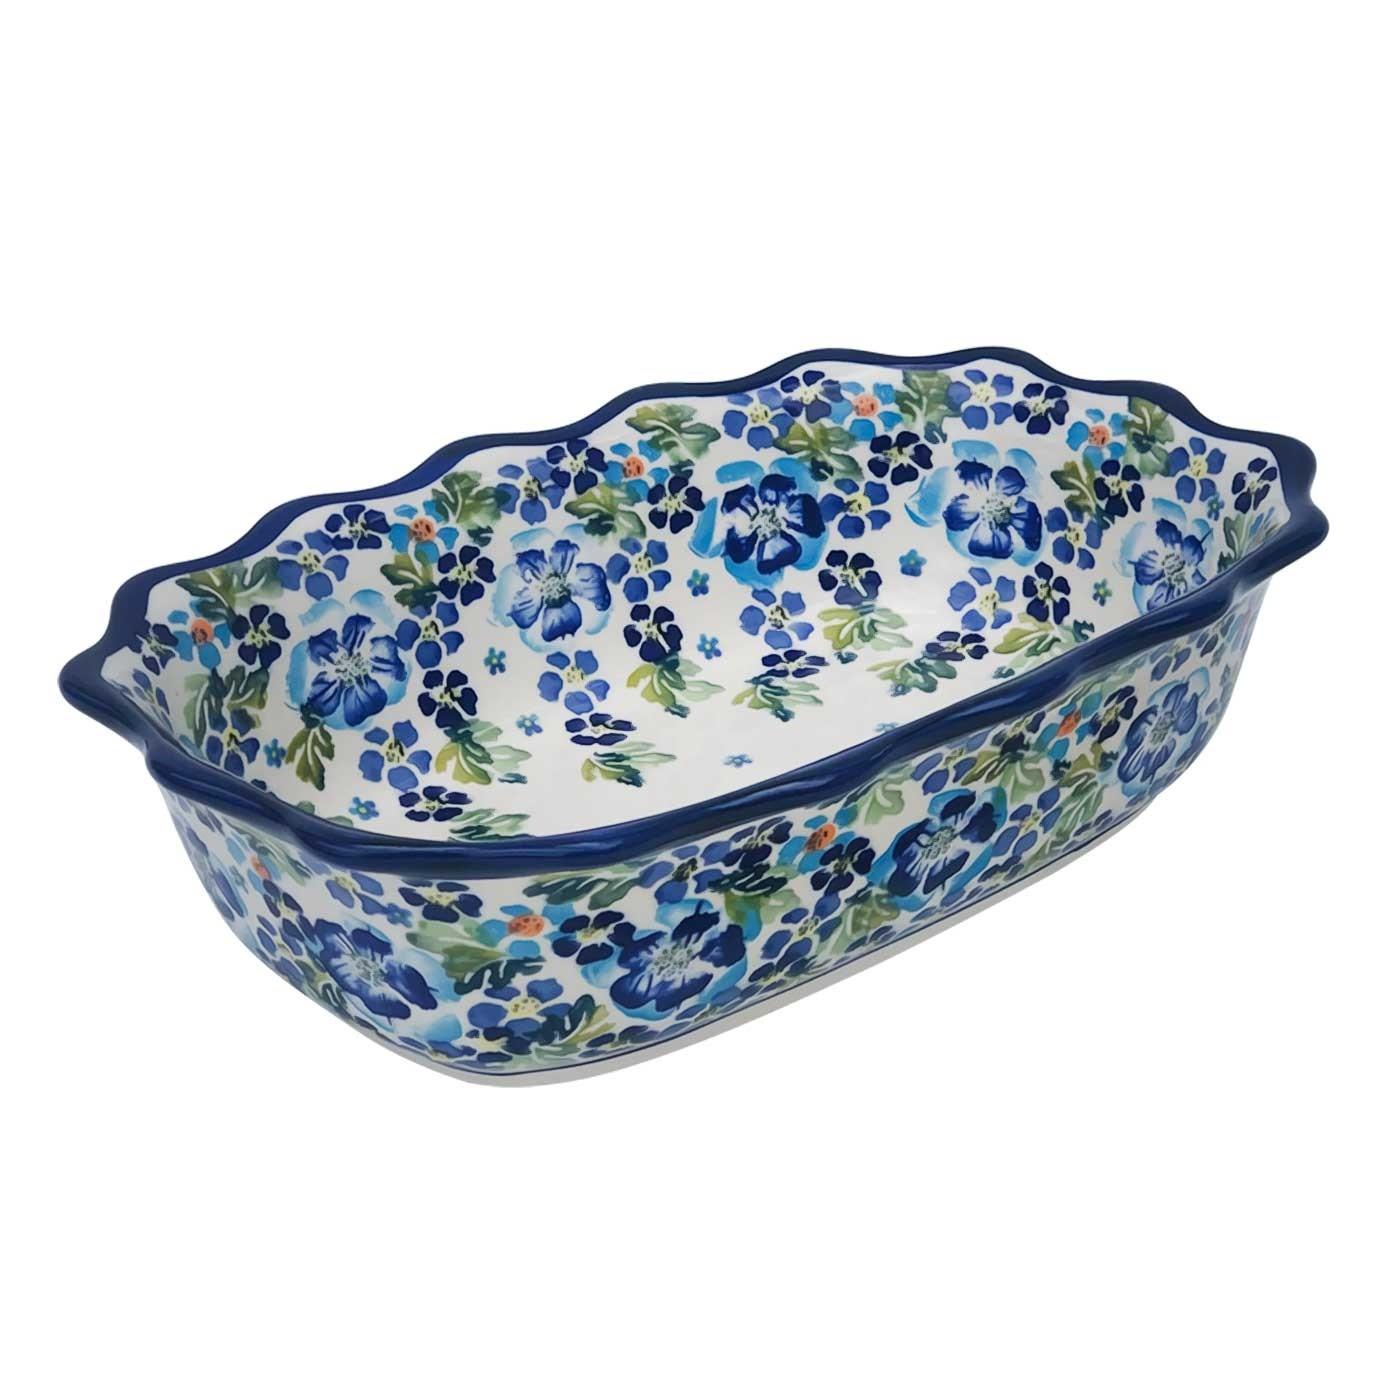 "Pottery Avenue 11.5"" Fancy Rimmed Stoneware Baker-Serving Bowl, 66-oz - 1854-Du207 True Blues"